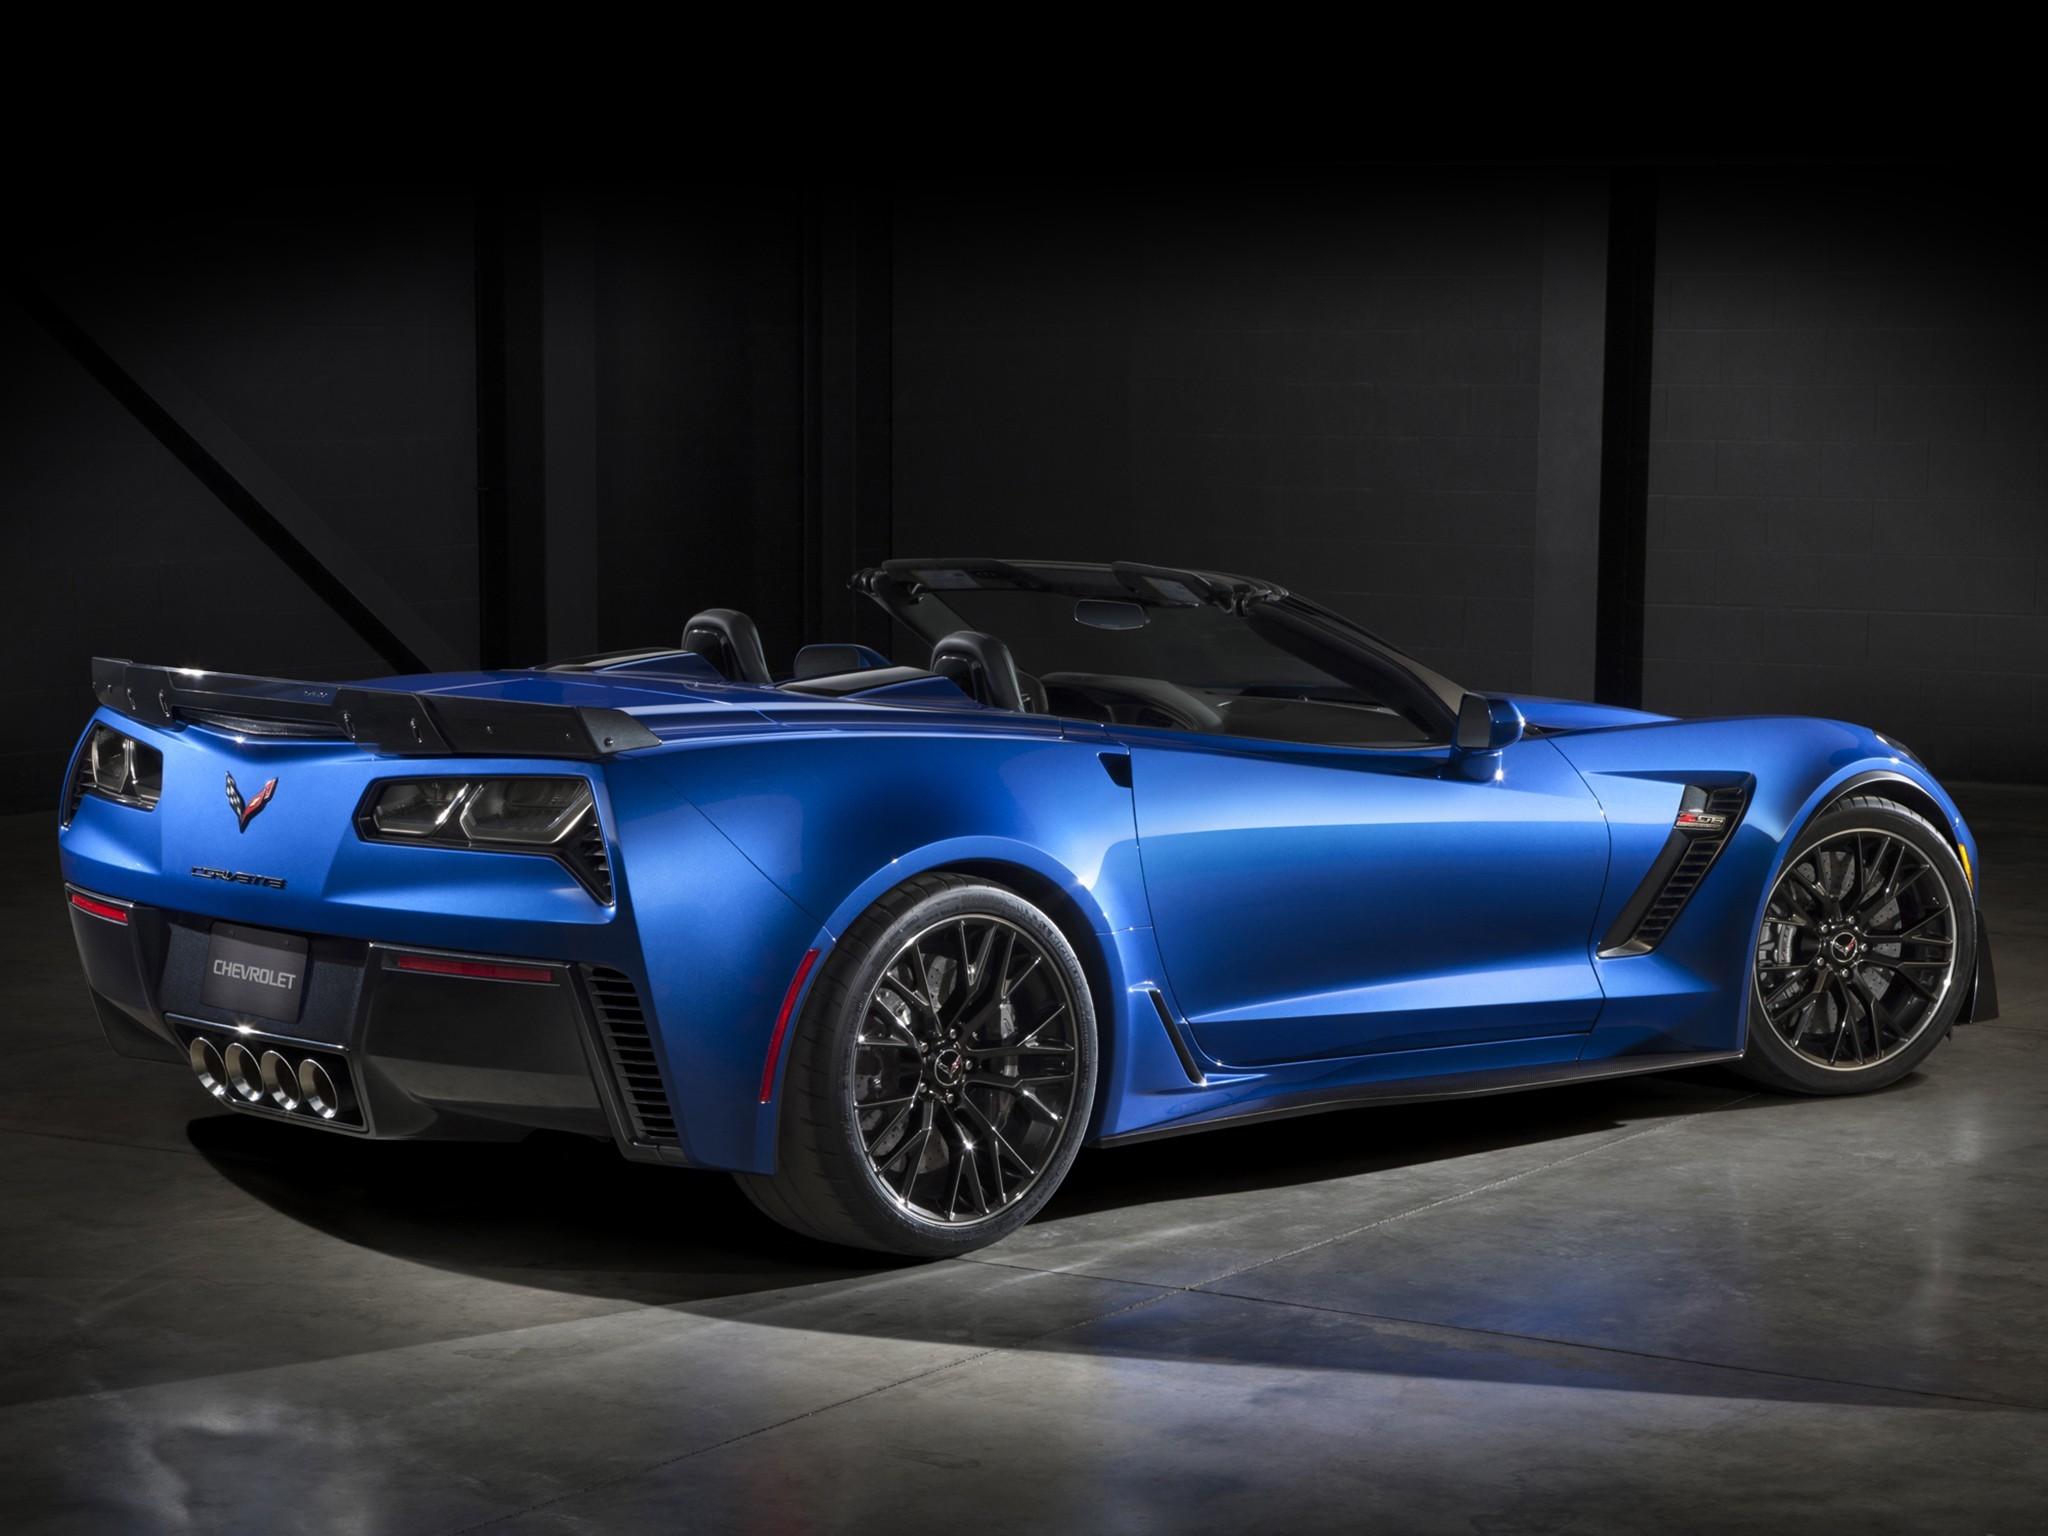 1920x1200 2015 Chevrolet Corvette C7 Stingray